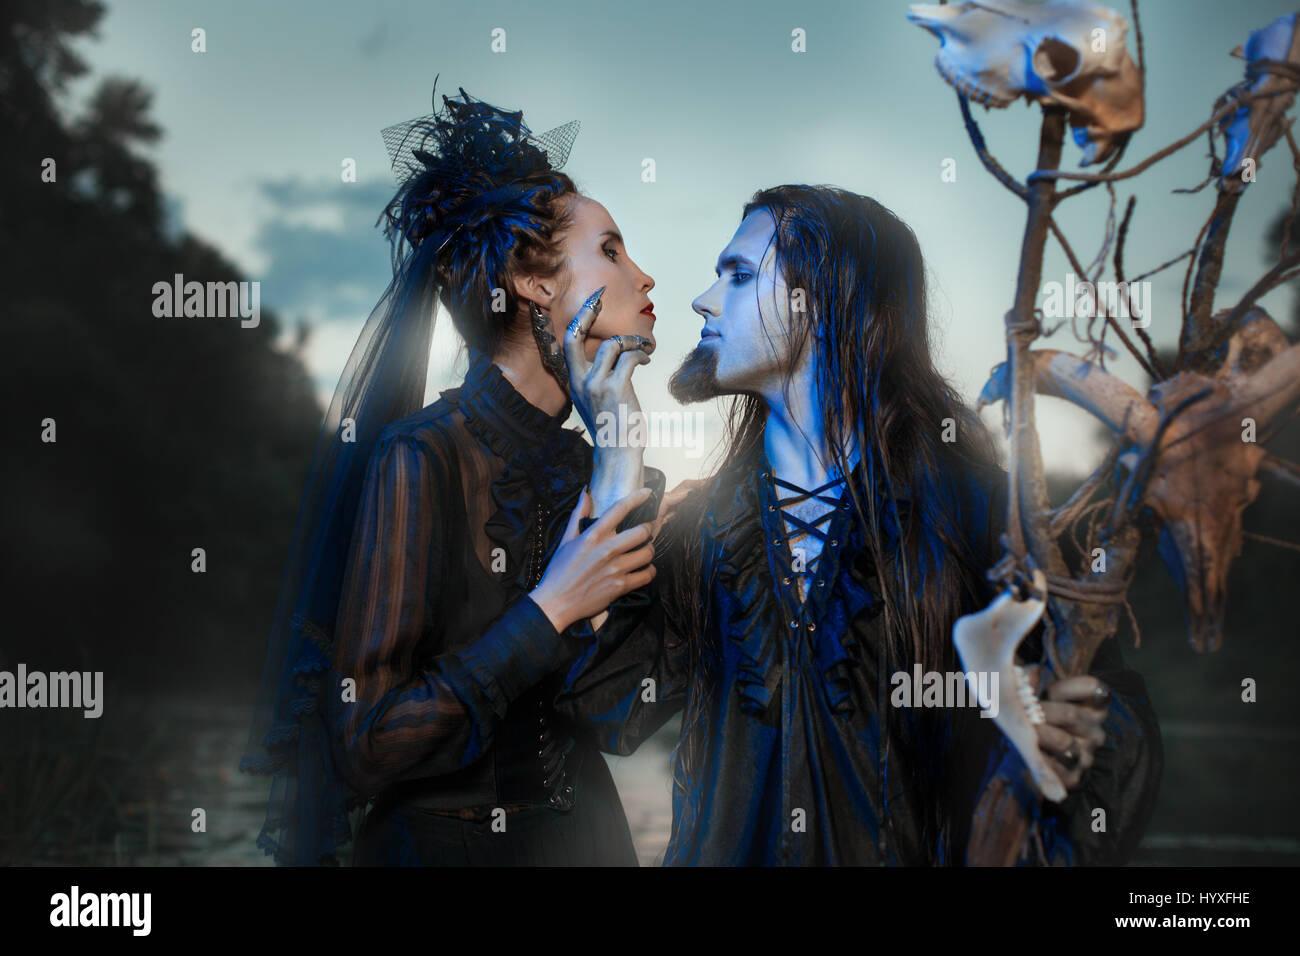 Creepy people conjure night, they look like demons. - Stock Image